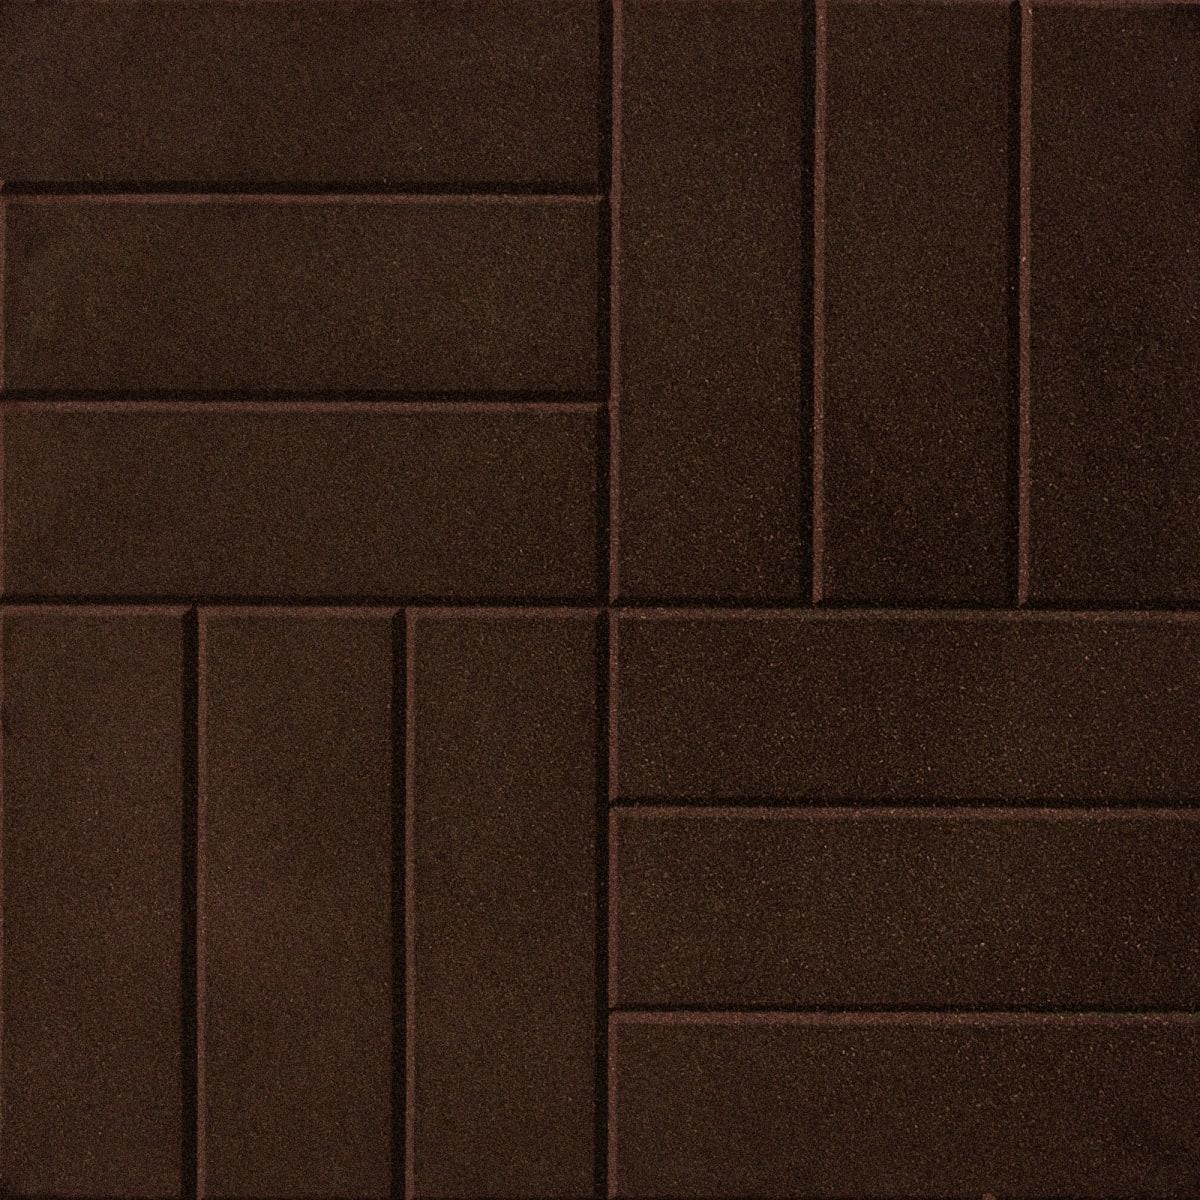 Плитка резиновая 500х500х30 мм паркет пуансон коричневый